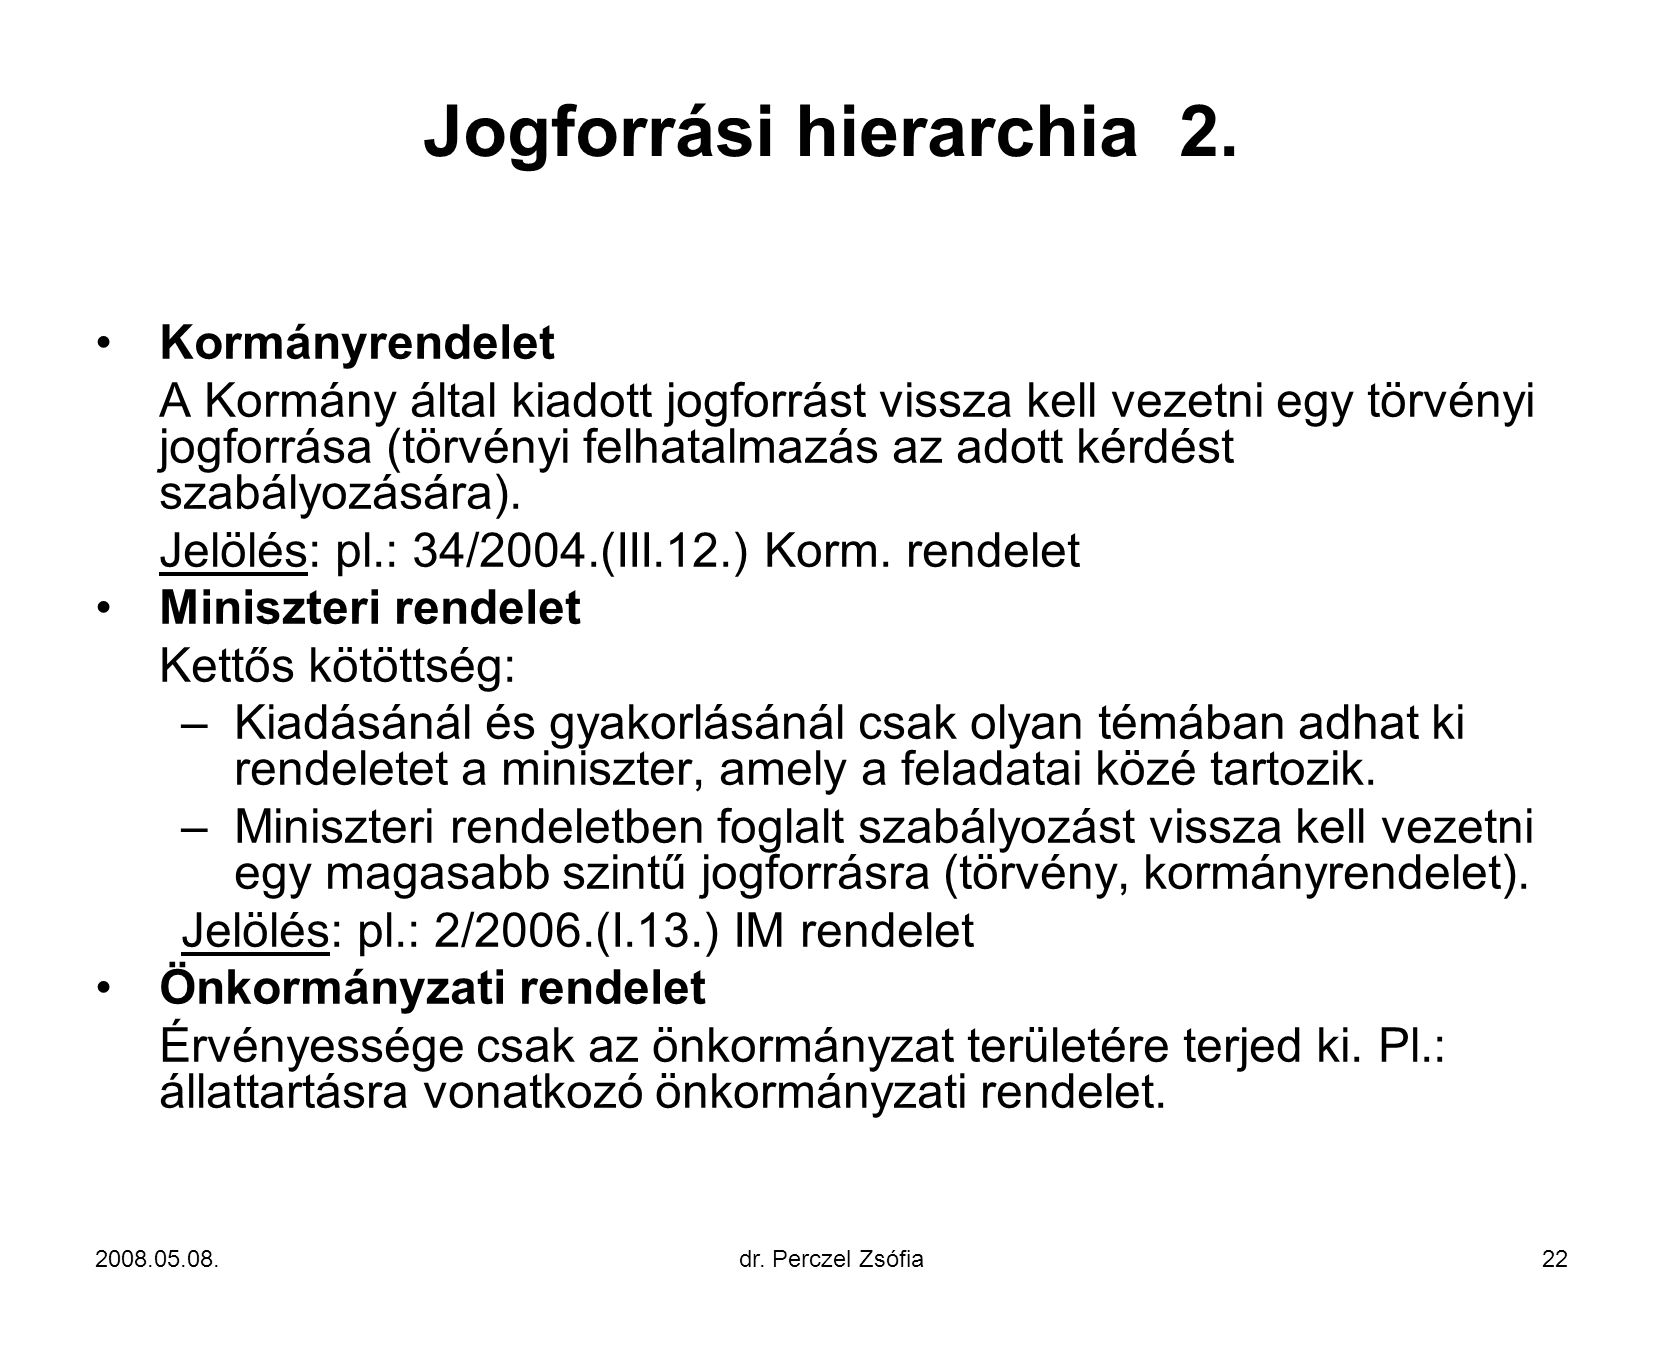 Jogforrási hierarchia 2.